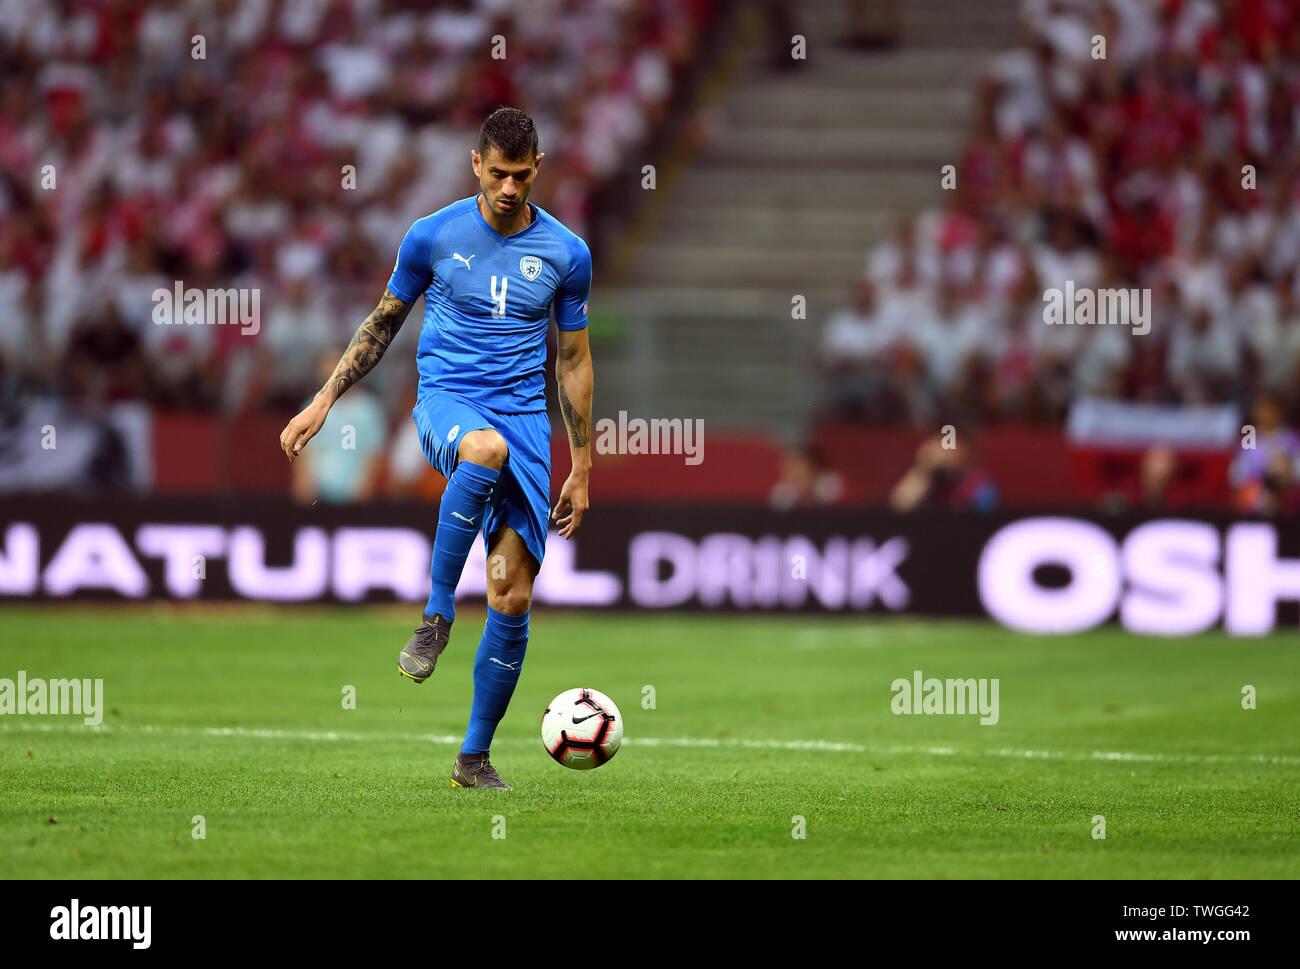 Warsaw, Poland, June 10, 2019: EURO 2020 qualifing round, group stage, Poland wins 4:0 with Izarel on PGE Narodowy. Nir Bitton (Izrael) - Stock Image